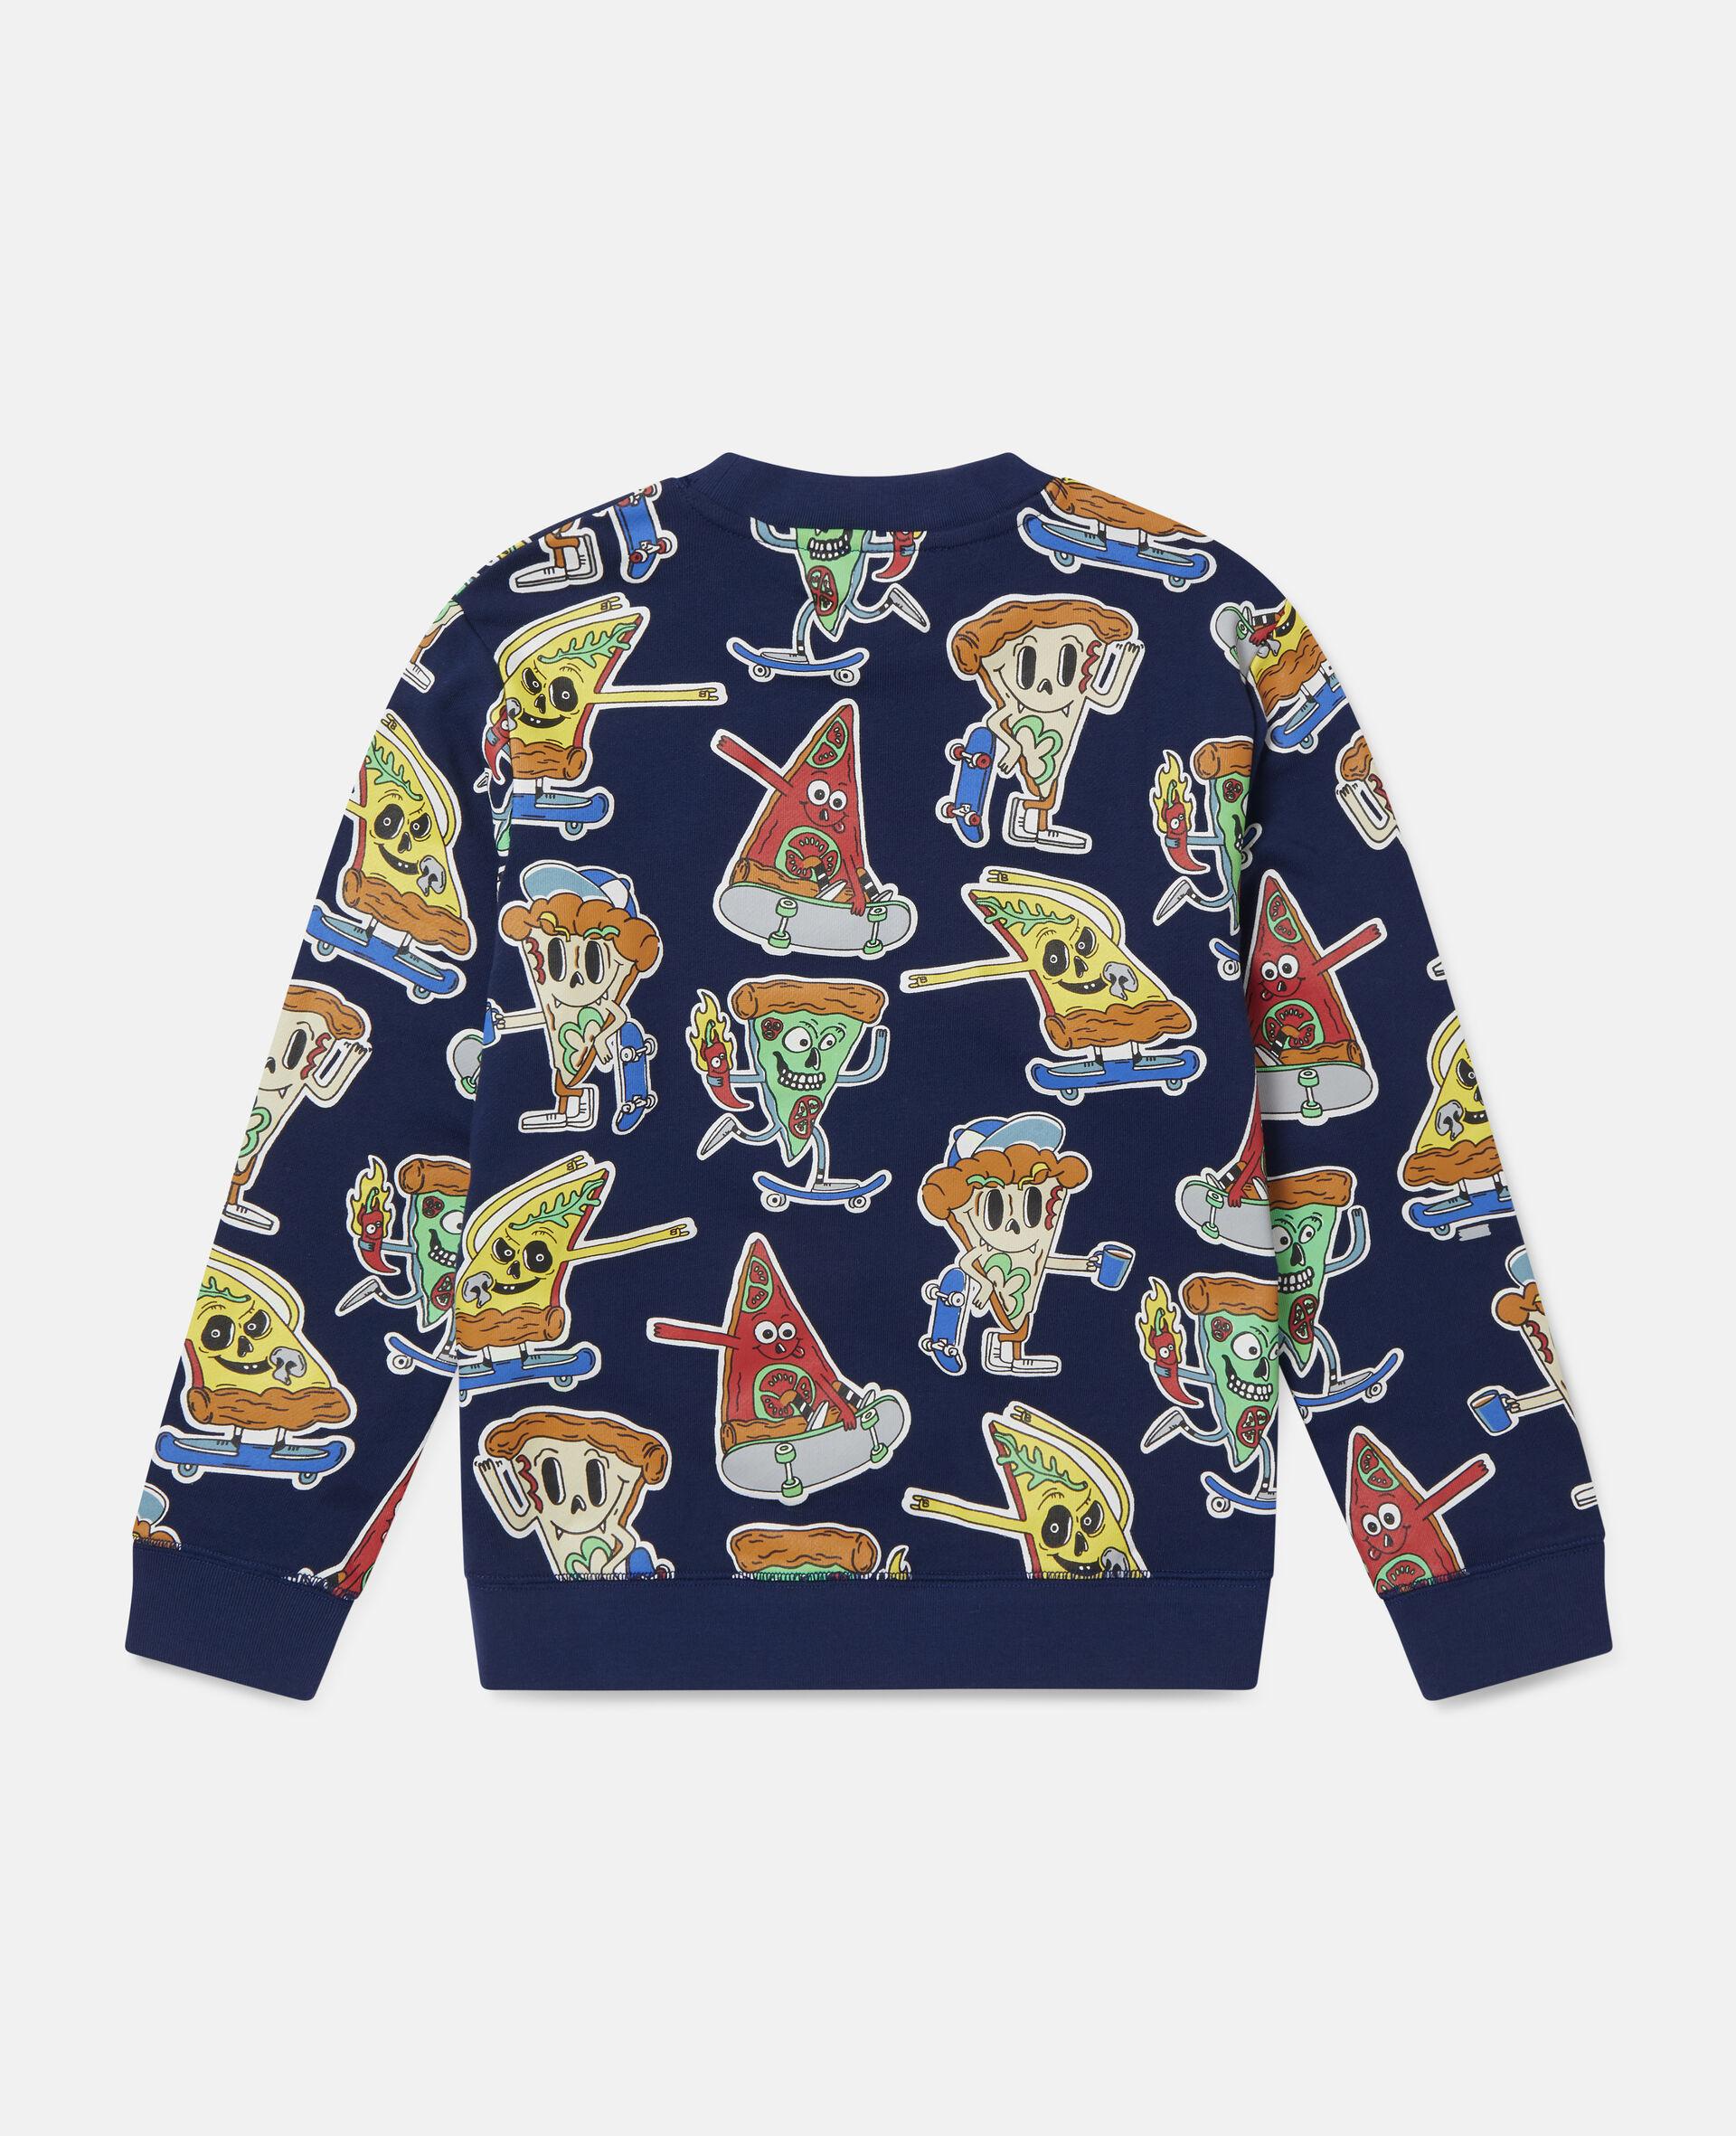 Fleece-Sweatshirt mit Pizza-Skater-Motiv-Blau-large image number 3